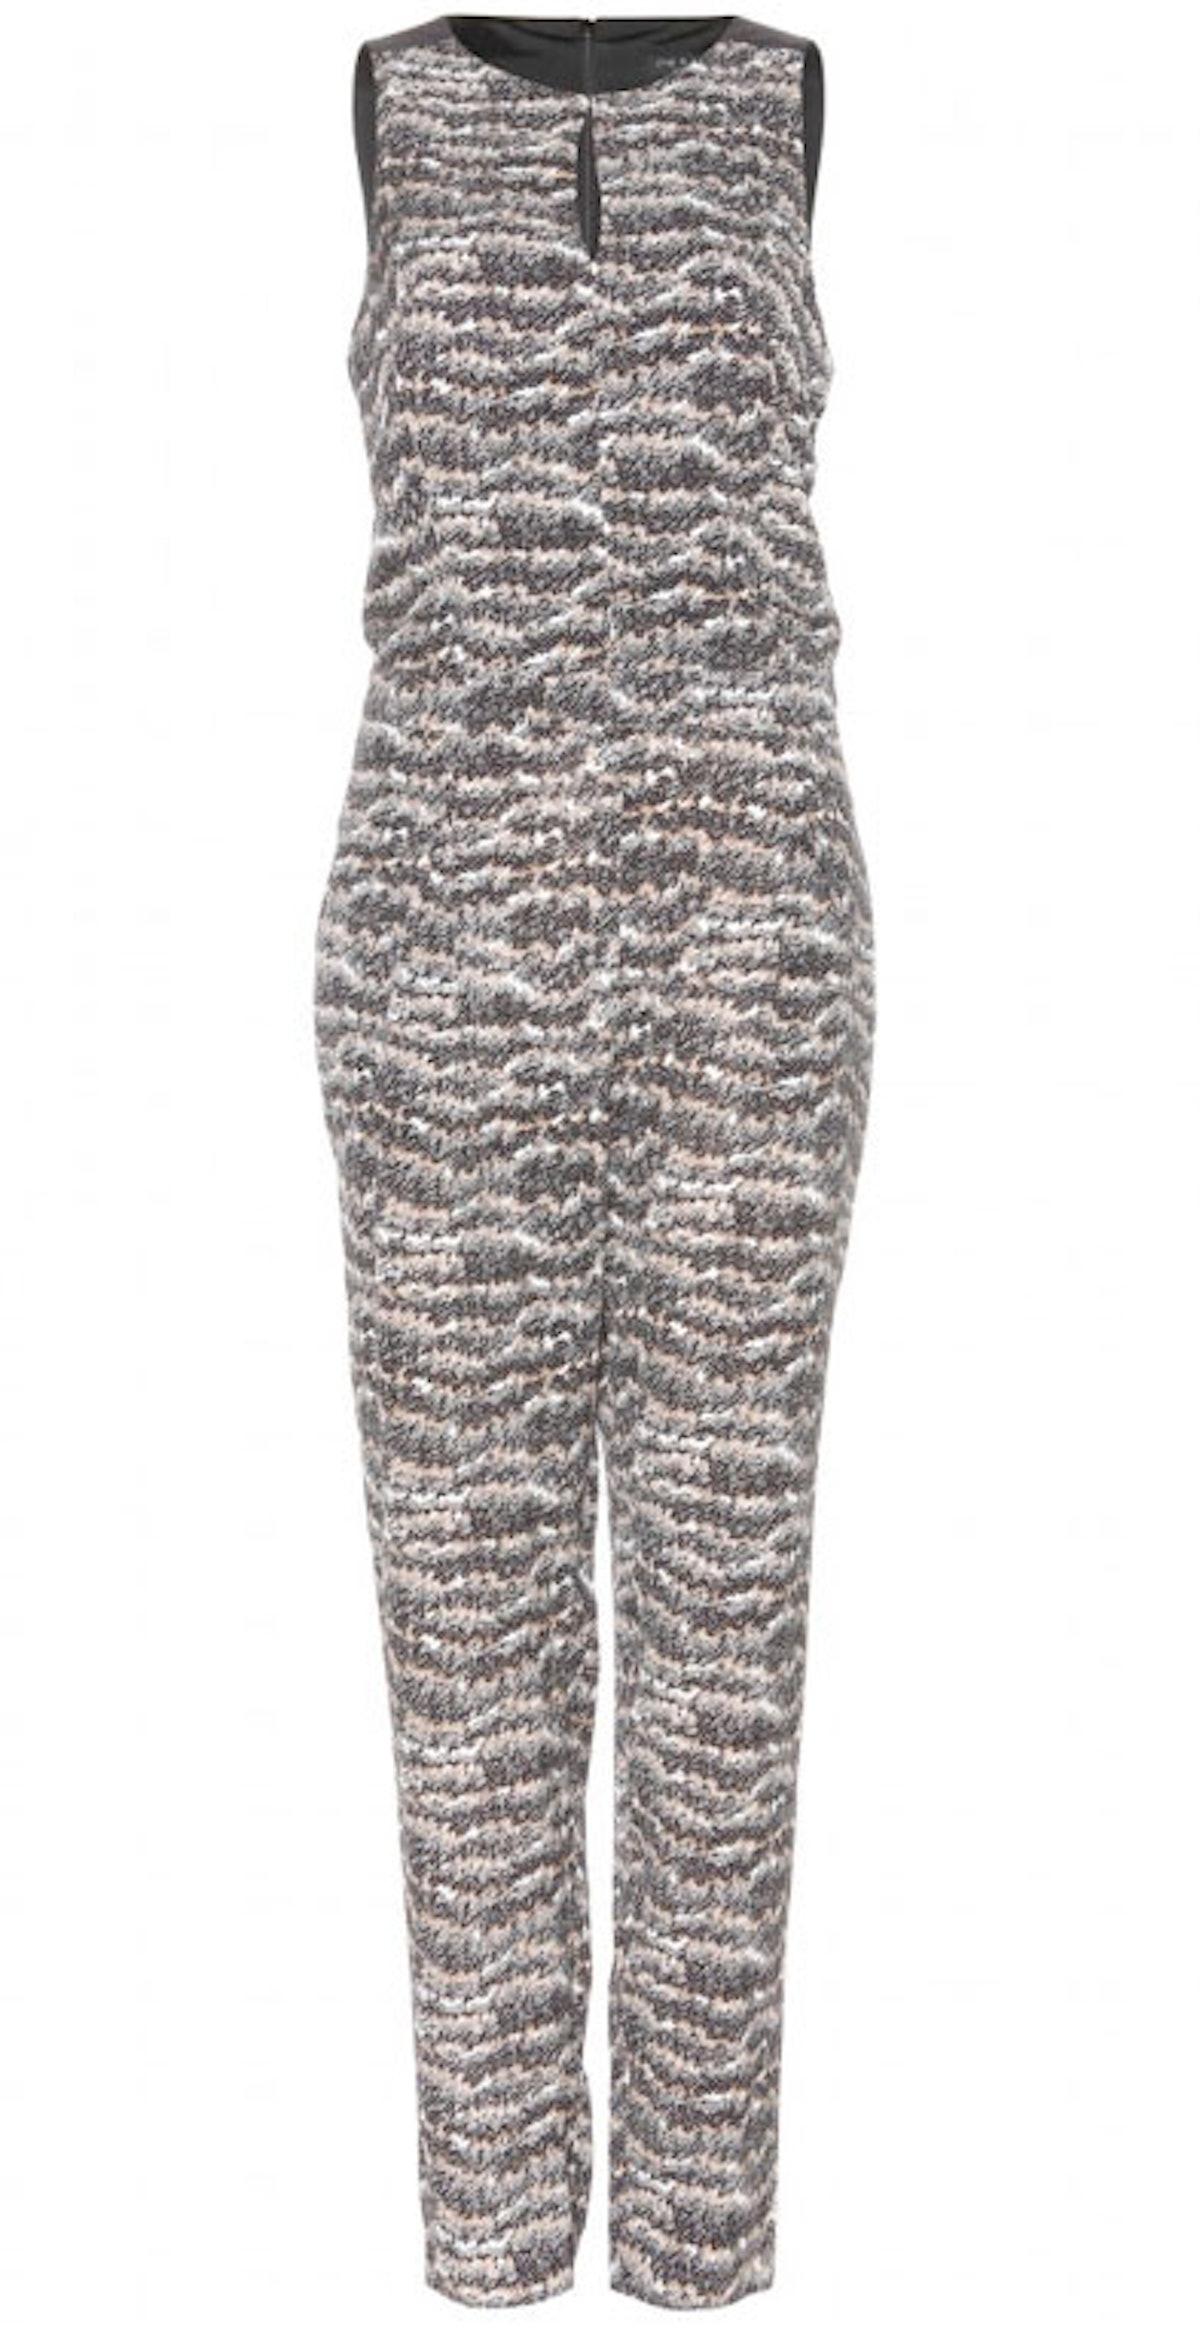 Rag & Bone jumpsuit